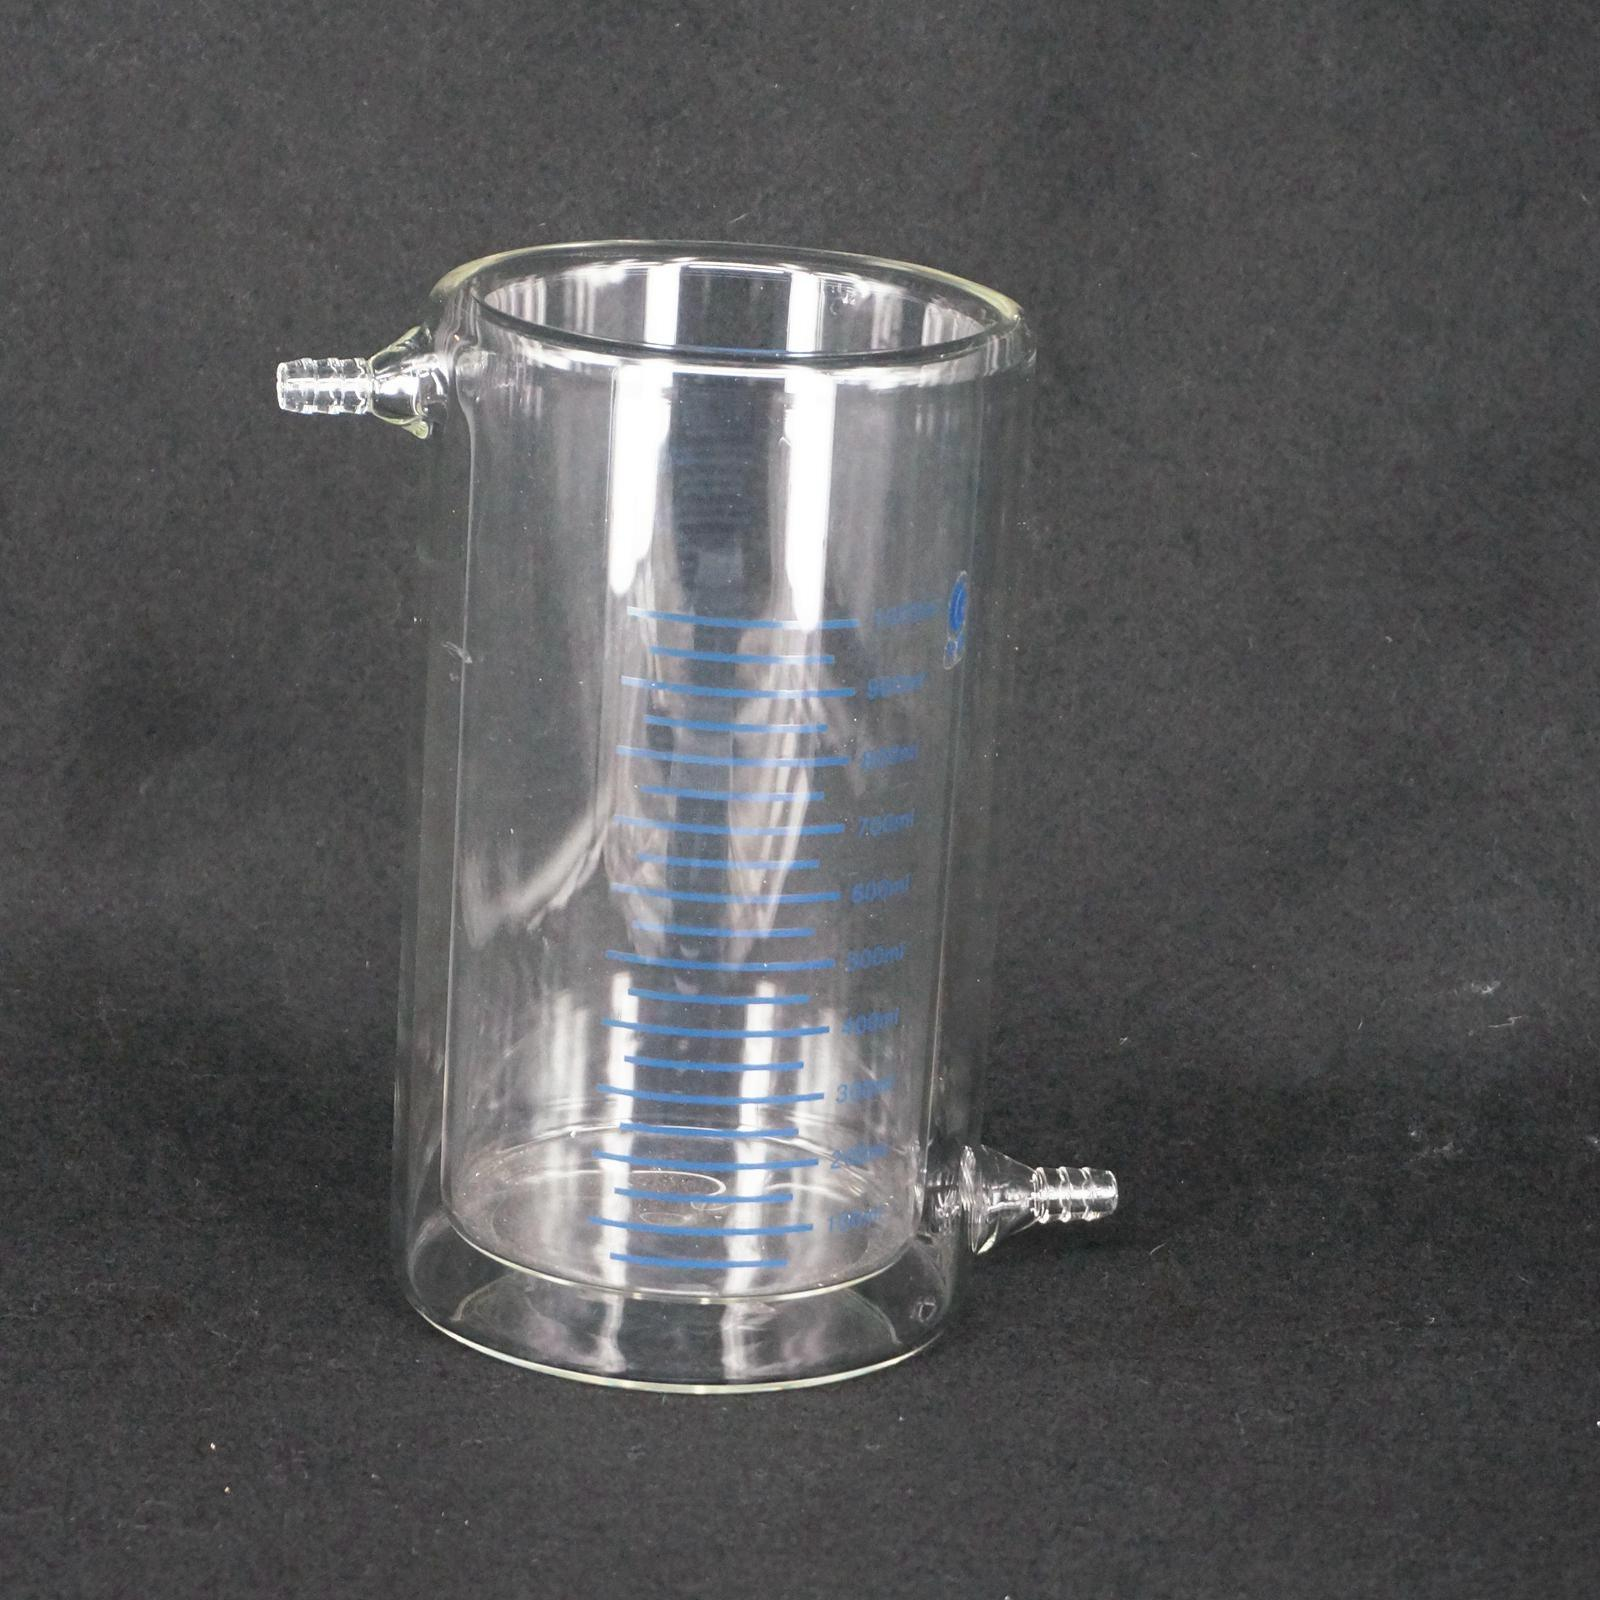 1000ml Laboratory Jacketed Borosilicate Glass Beaker Double Layer Beaker for Photocatalytic Experiment FREE SHIP 300mm 24 29 joint borosilicate glass jacket allihn bulb condenser distillation for laboratory